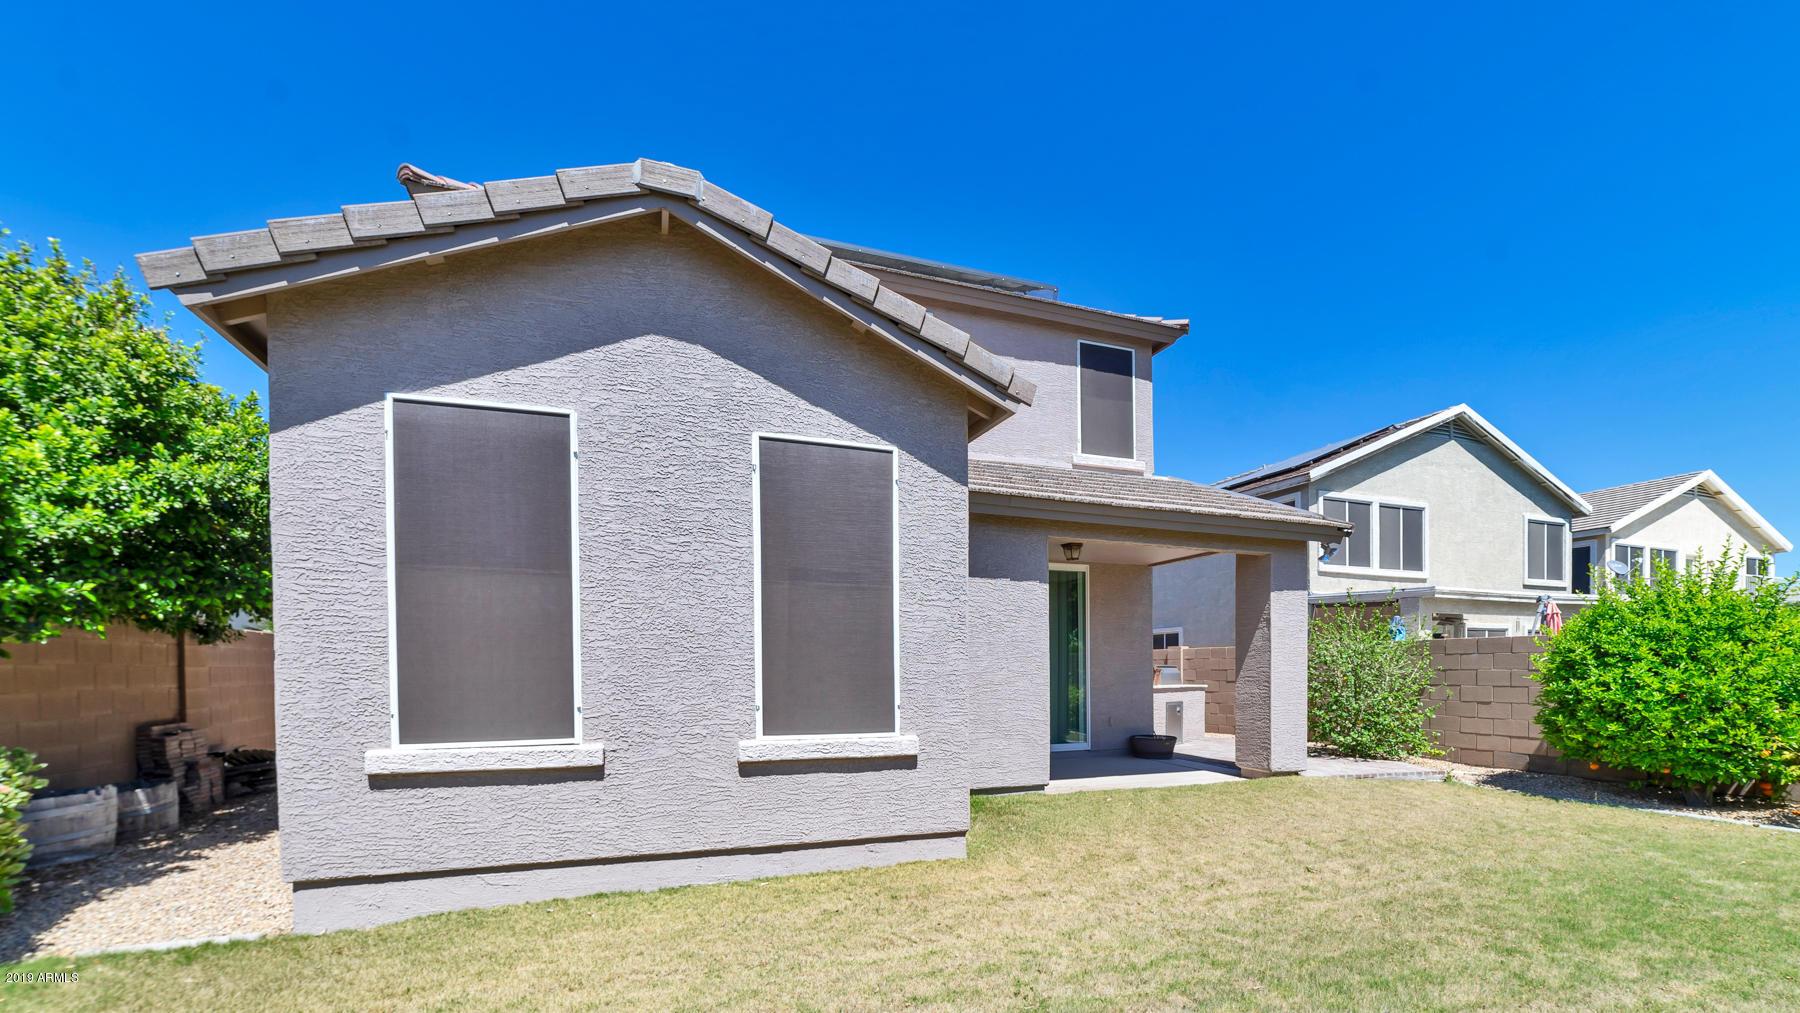 MLS 5910144 14843 W LAUREL Lane, Surprise, AZ 85379 Surprise AZ Rancho Gabriela